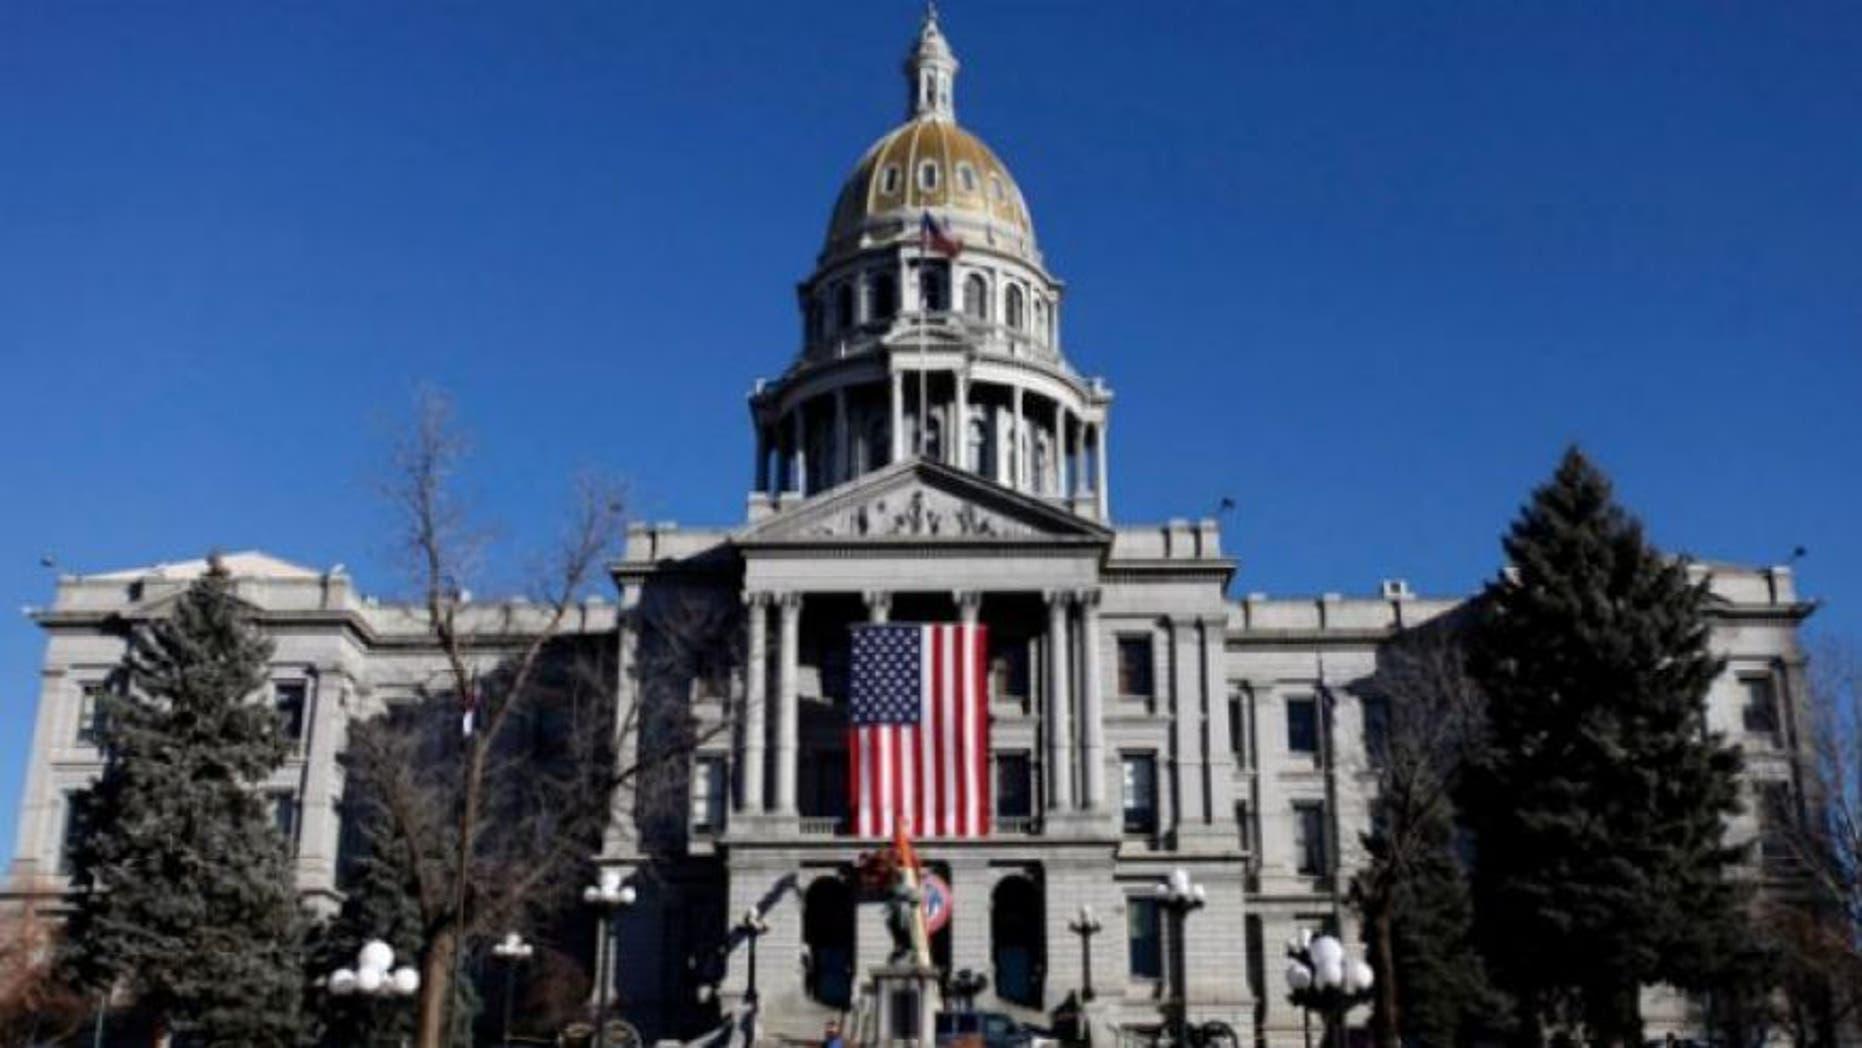 The Colorado State Capitol in Denver.